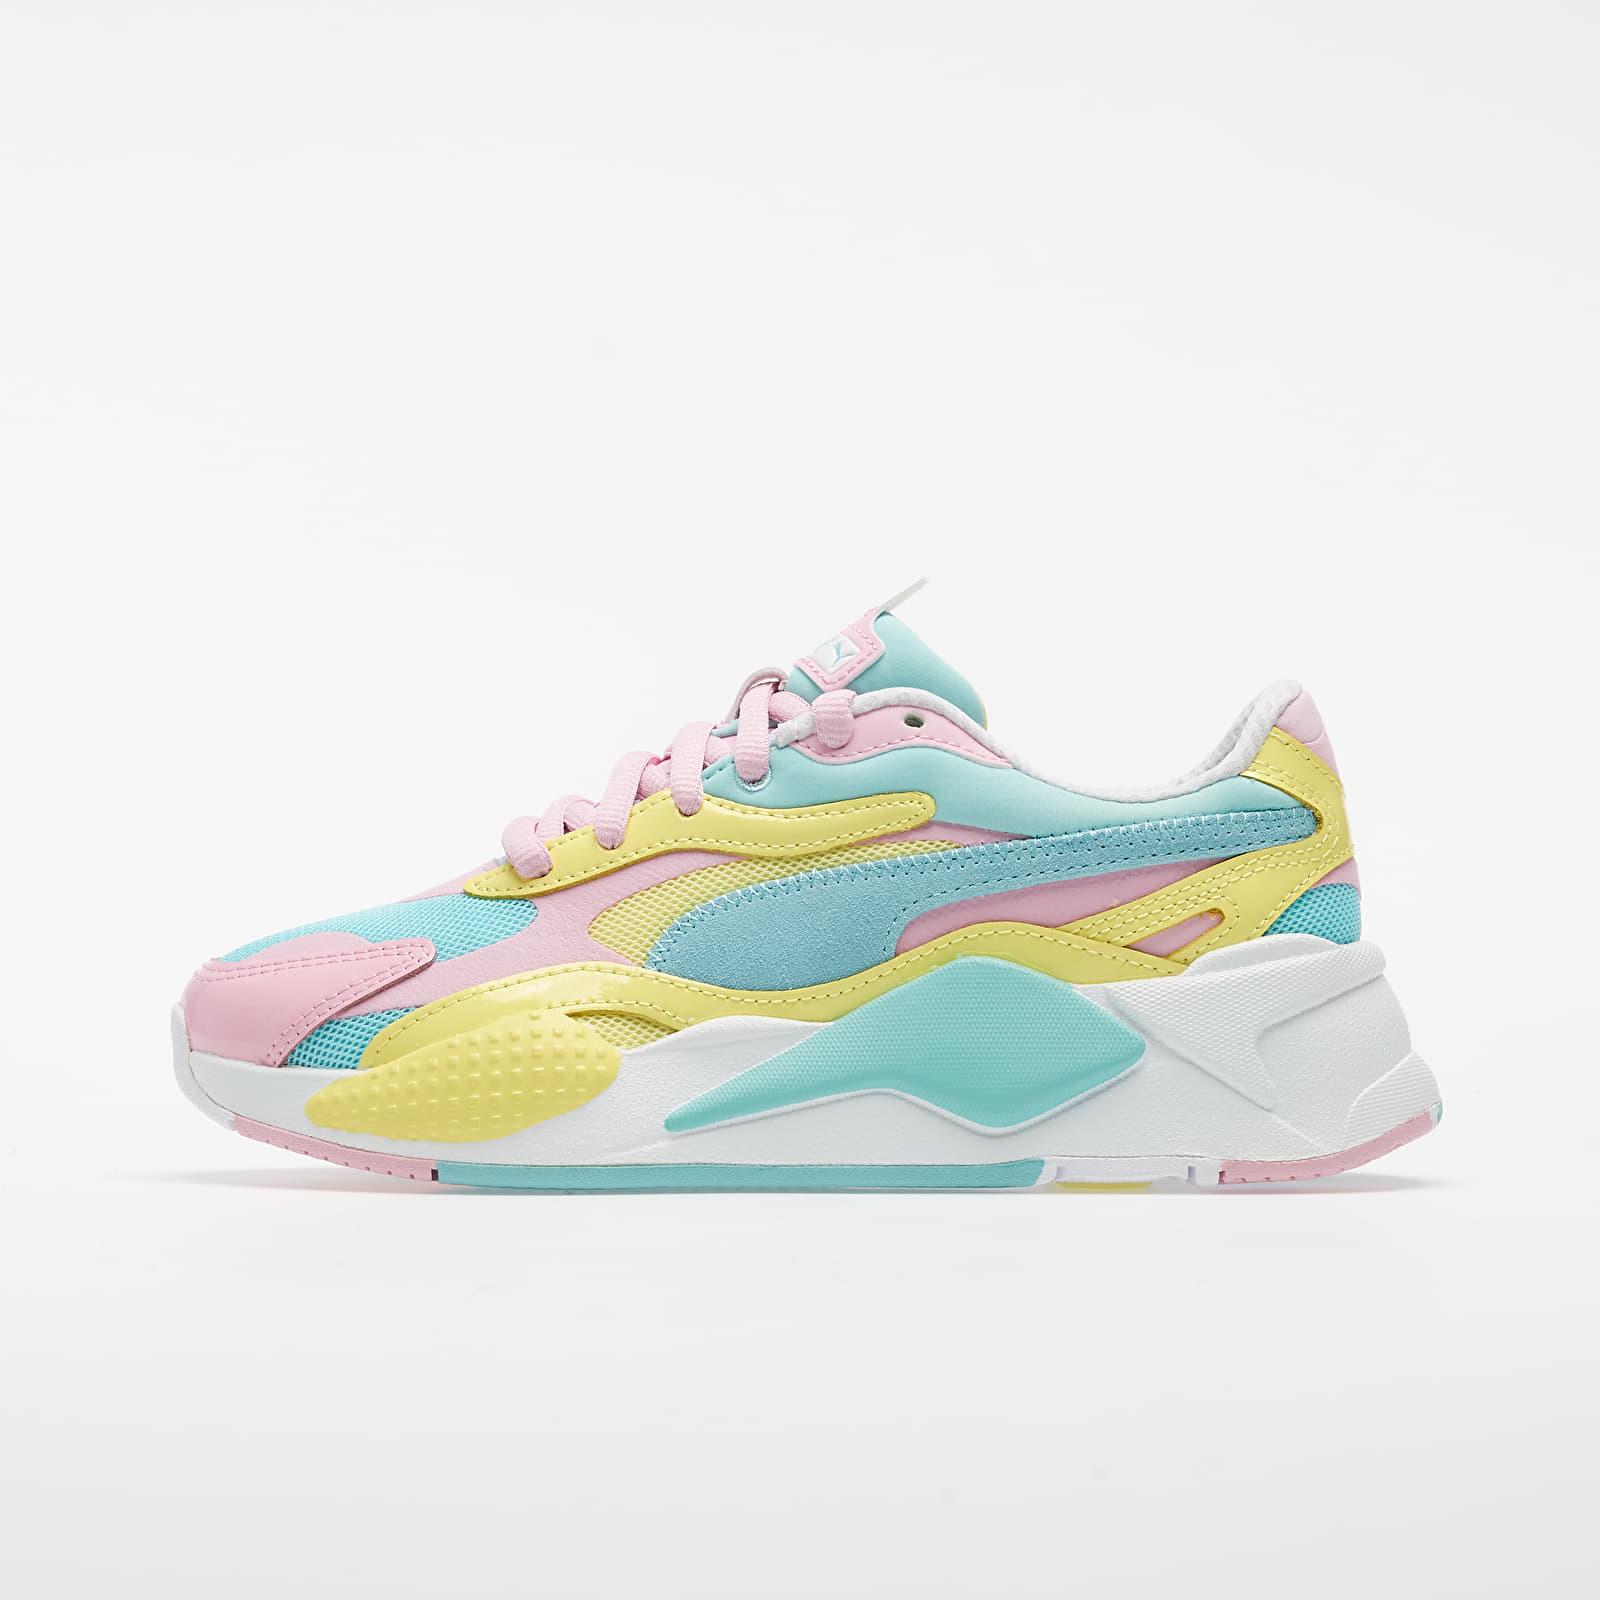 Pánské tenisky a boty Puma RS-X³ Plastic Gulf Stream-Sunny Lime